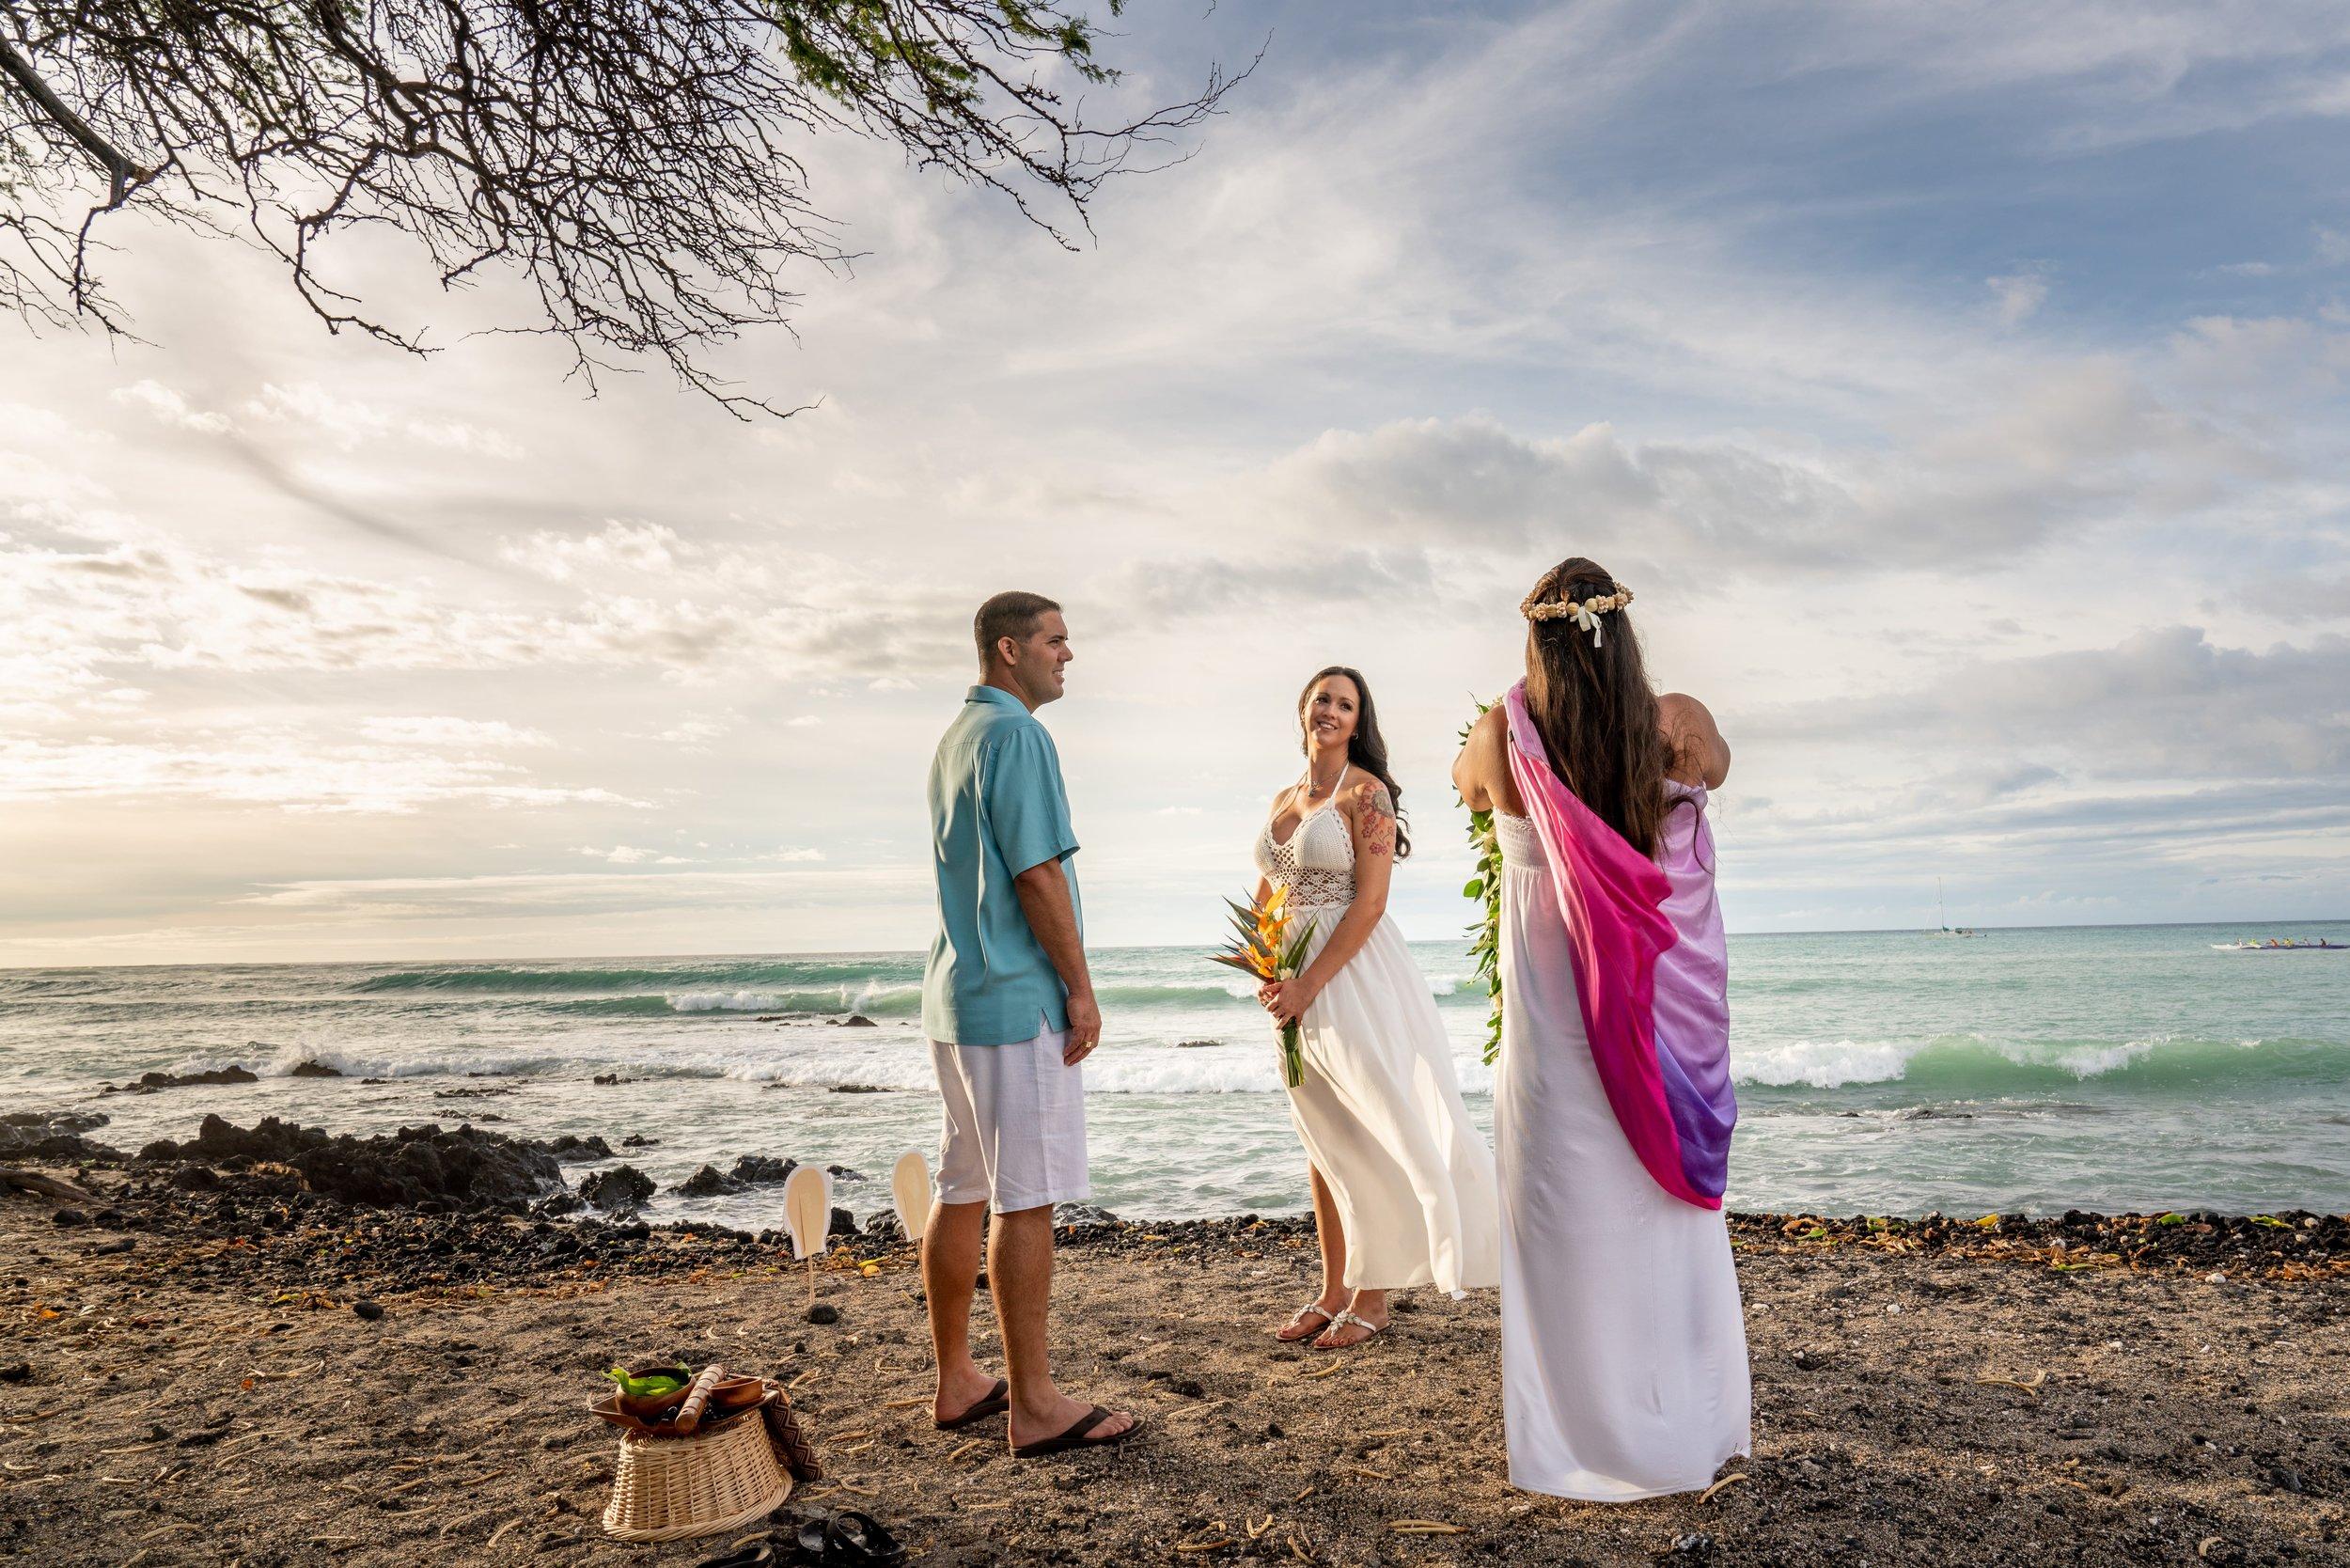 Big-Island-Wedding-Brides-LGBT-Hawaii-Photographer-Nohea-Point-3-1.jpg